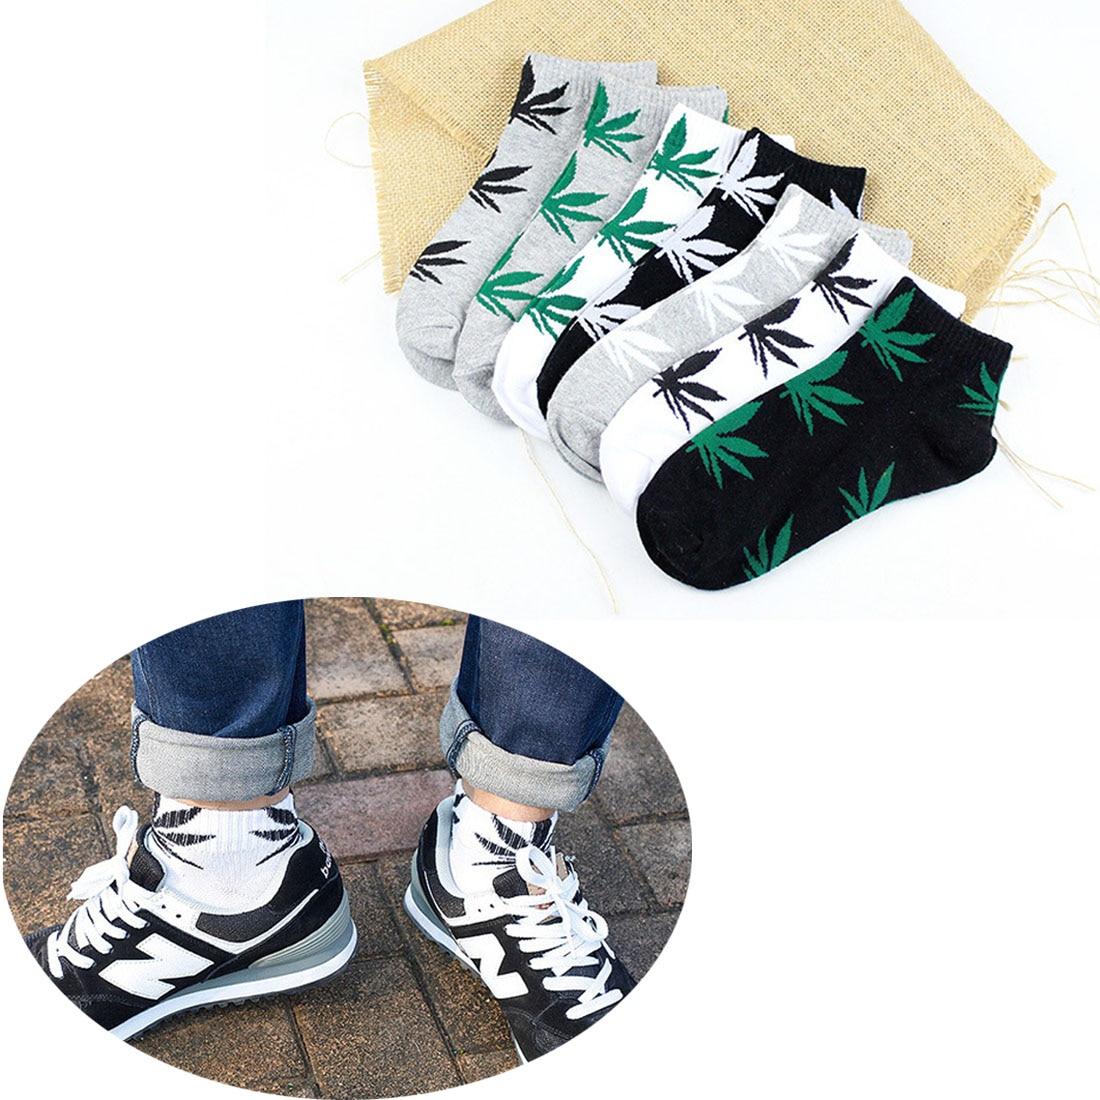 Comfortable Hemp Leaf Cotton Youthful Style Men Socks Slippers Short Ankle Socks Fancinating Ankle Socks 2019 Fashion New